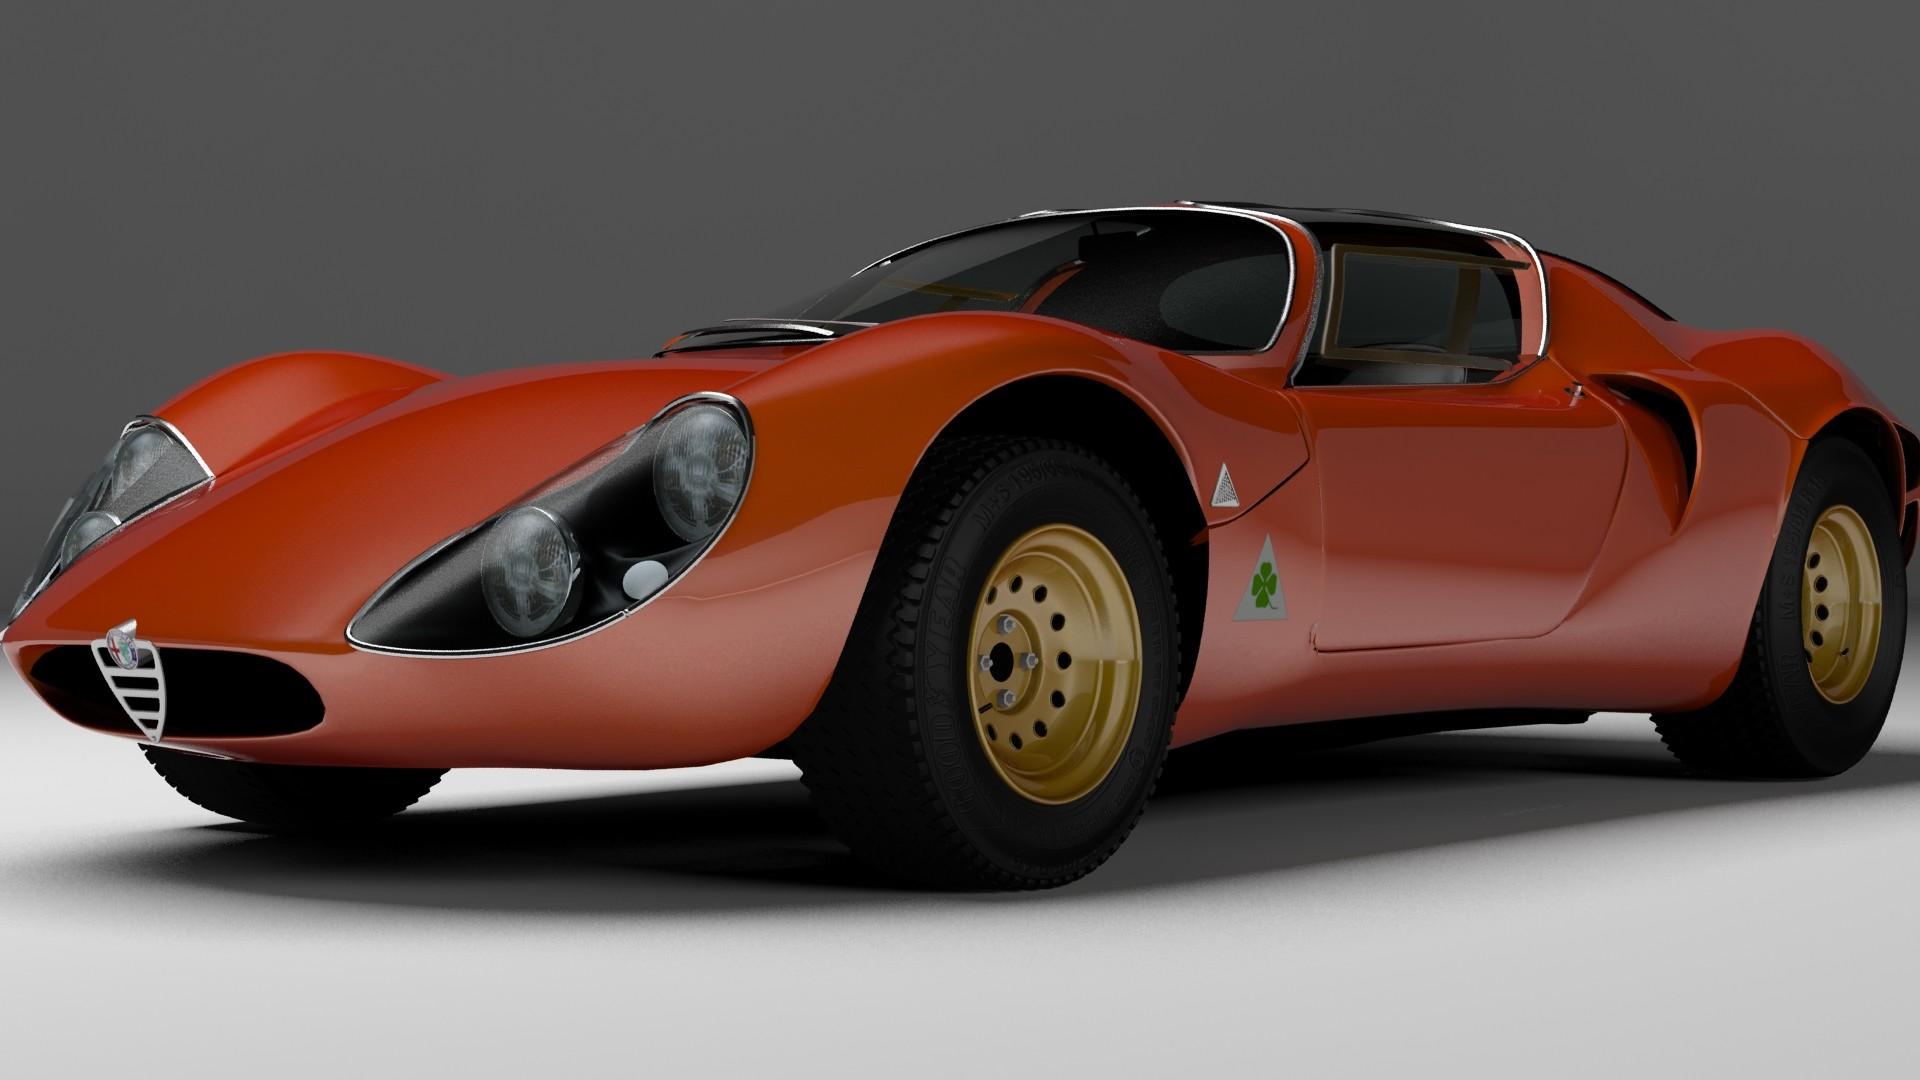 ArtStation - Alfa Romeo 33 Stradale, MARCO DINO PENNINO